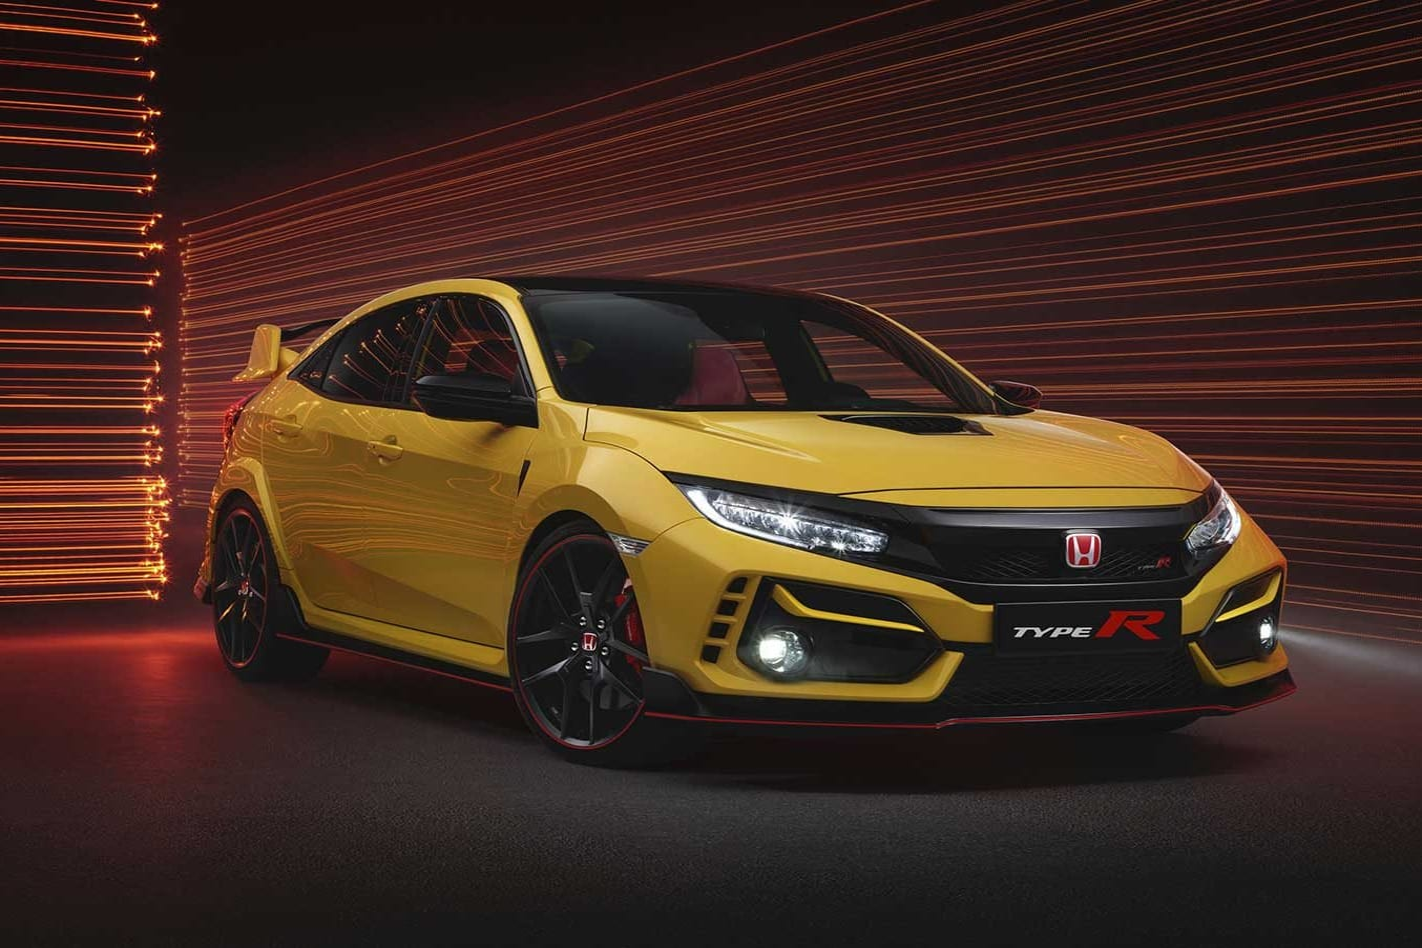 Honda Civic Type R Limited Edition revealed